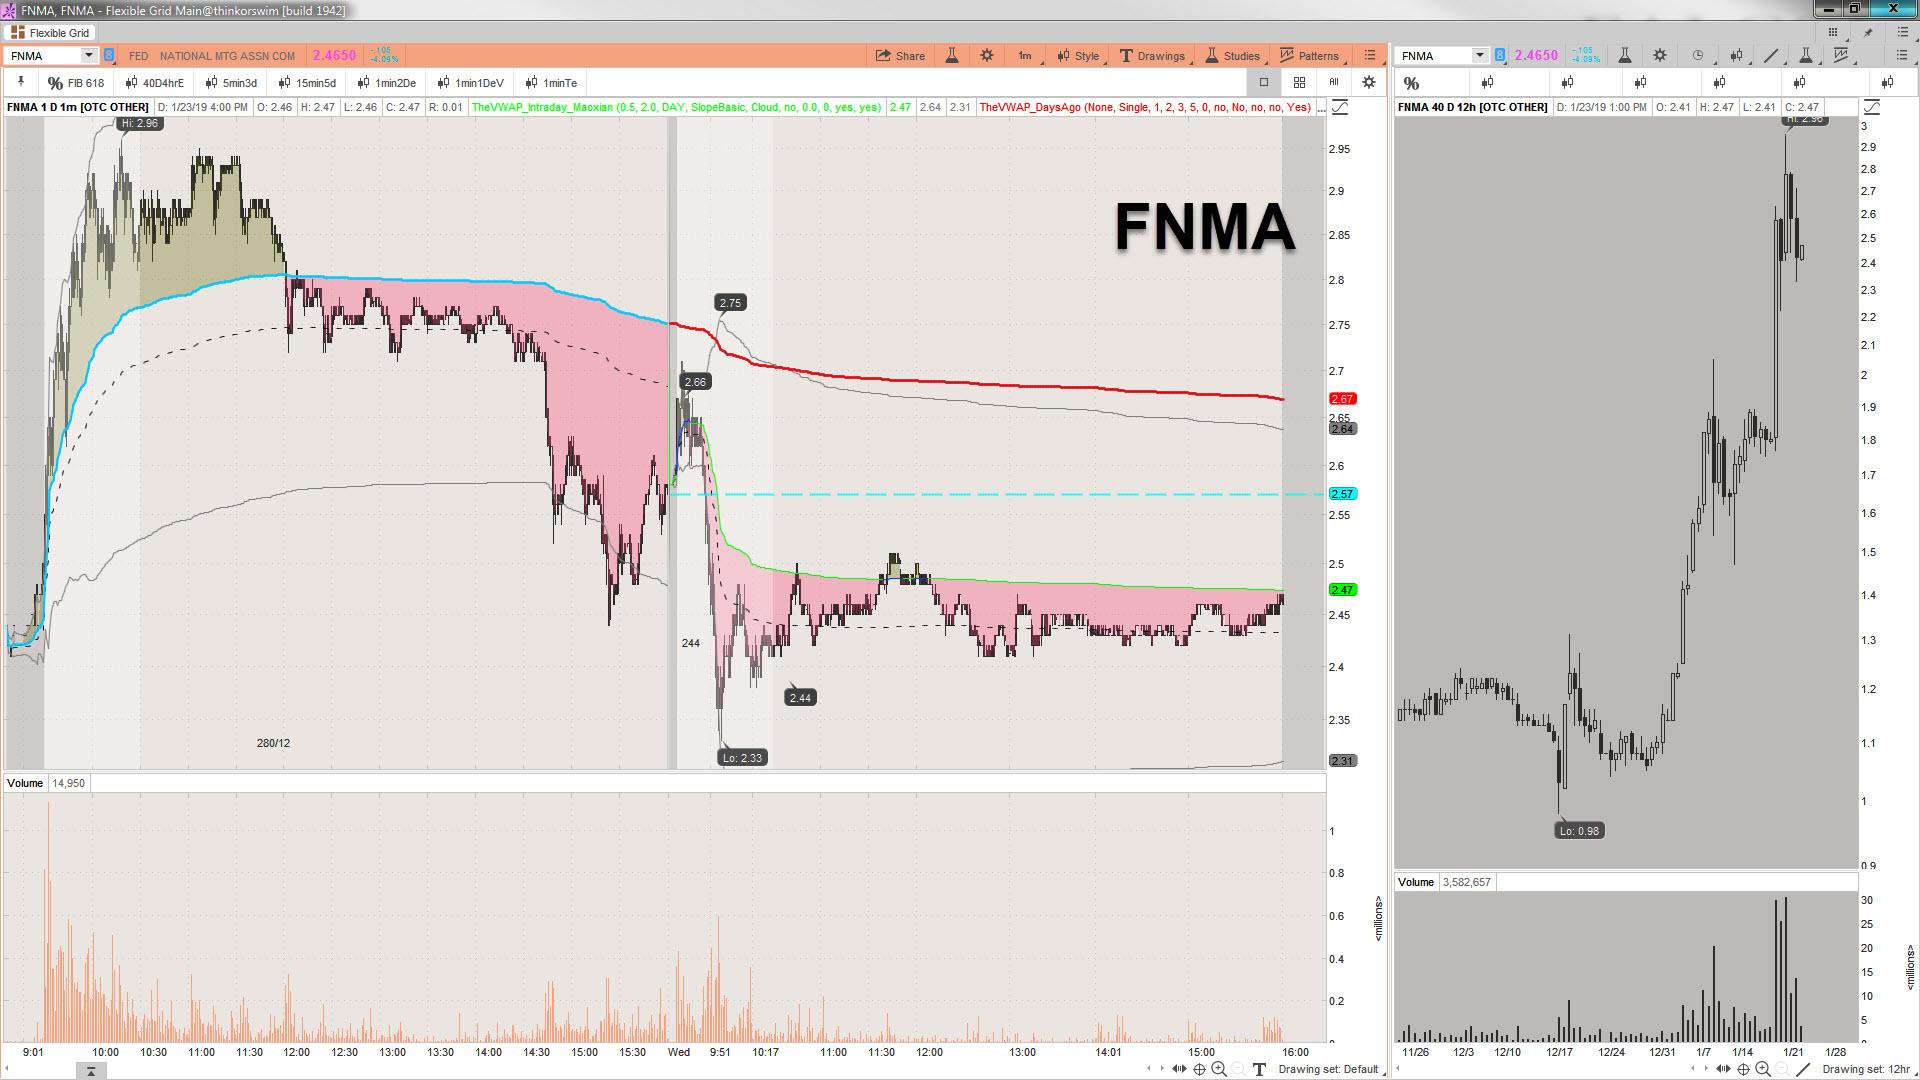 2019-01-23_16-17-32 FNMA.jpg